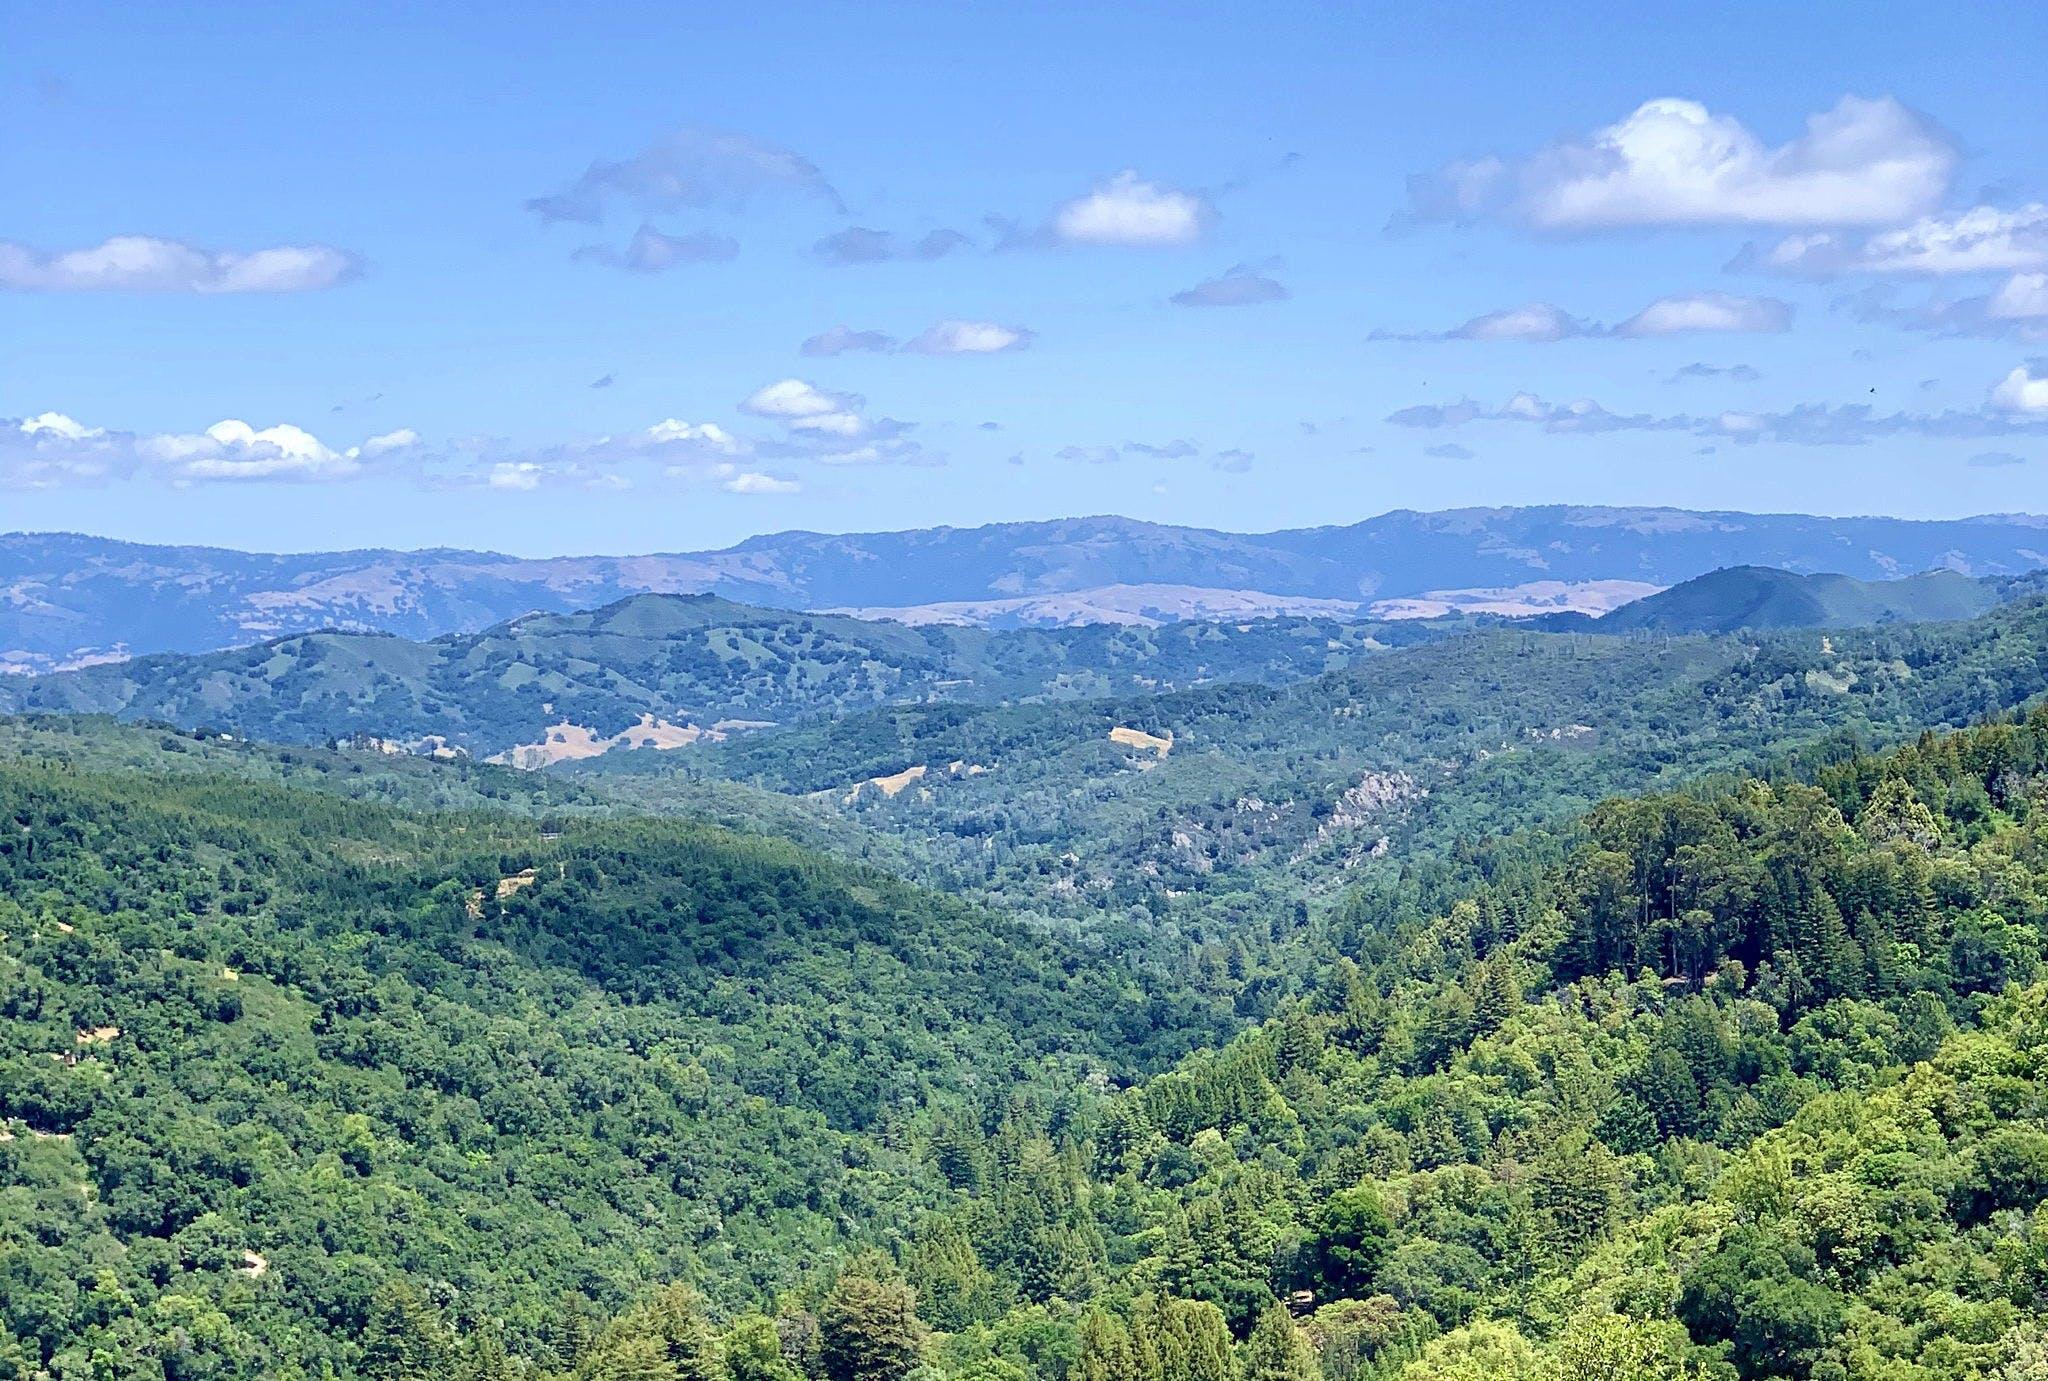 Viewpoint overlooking the Santa Cruz Mountains in Uvas Canyon County Park